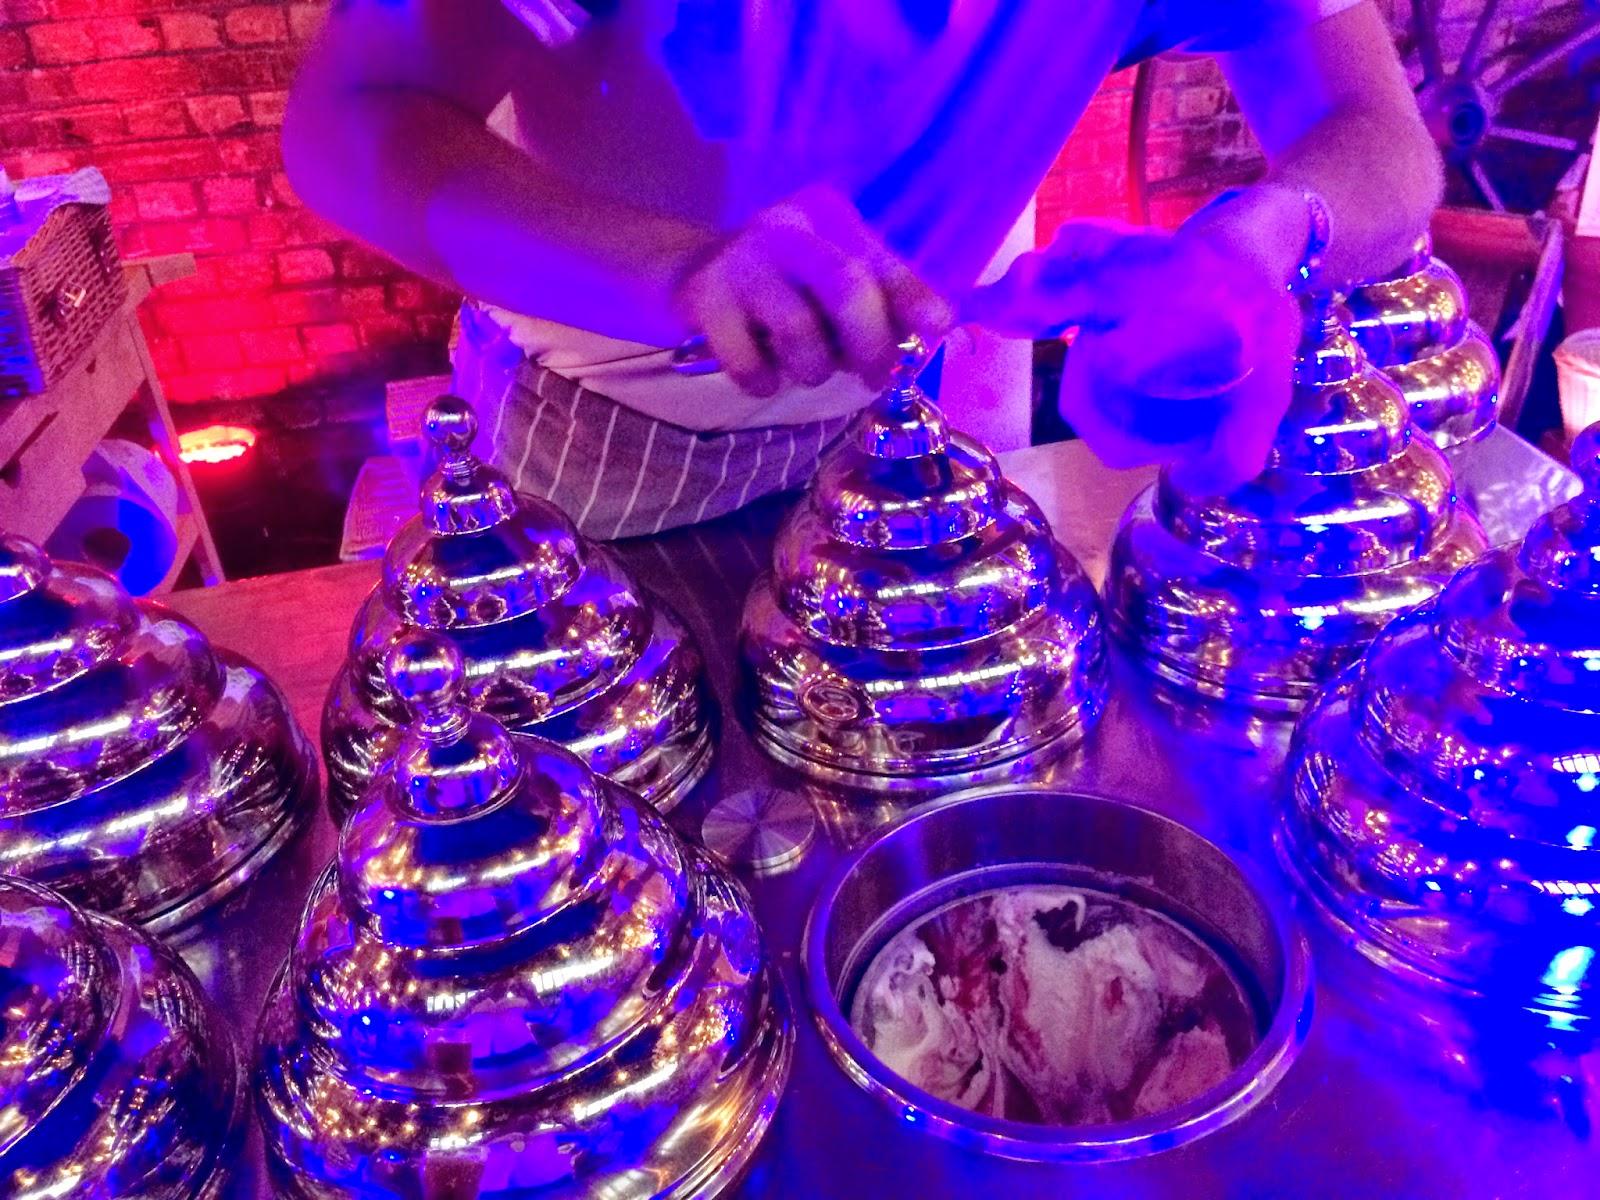 Eight different flavours of Gelupo ice cream - Moretti Gran Tour